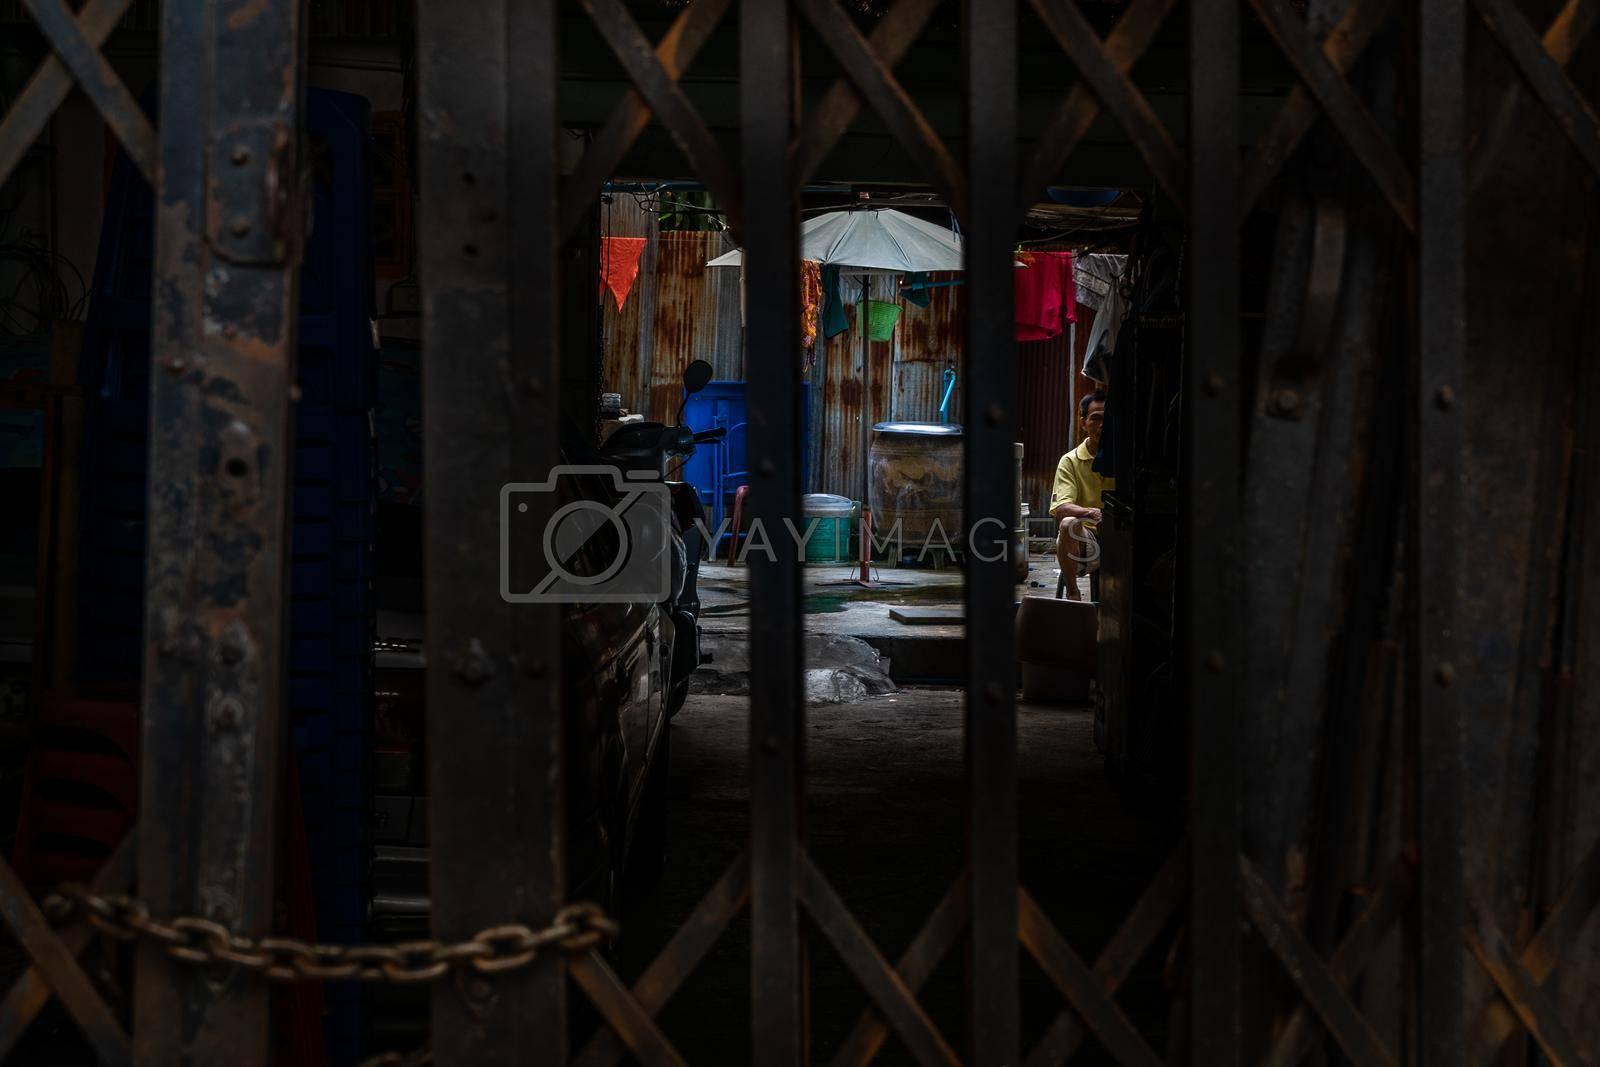 bangkok,Thailand - jun 29, 2019 : The ancient iron door that opened to see the interior where men were sitting behind the house. bangkok